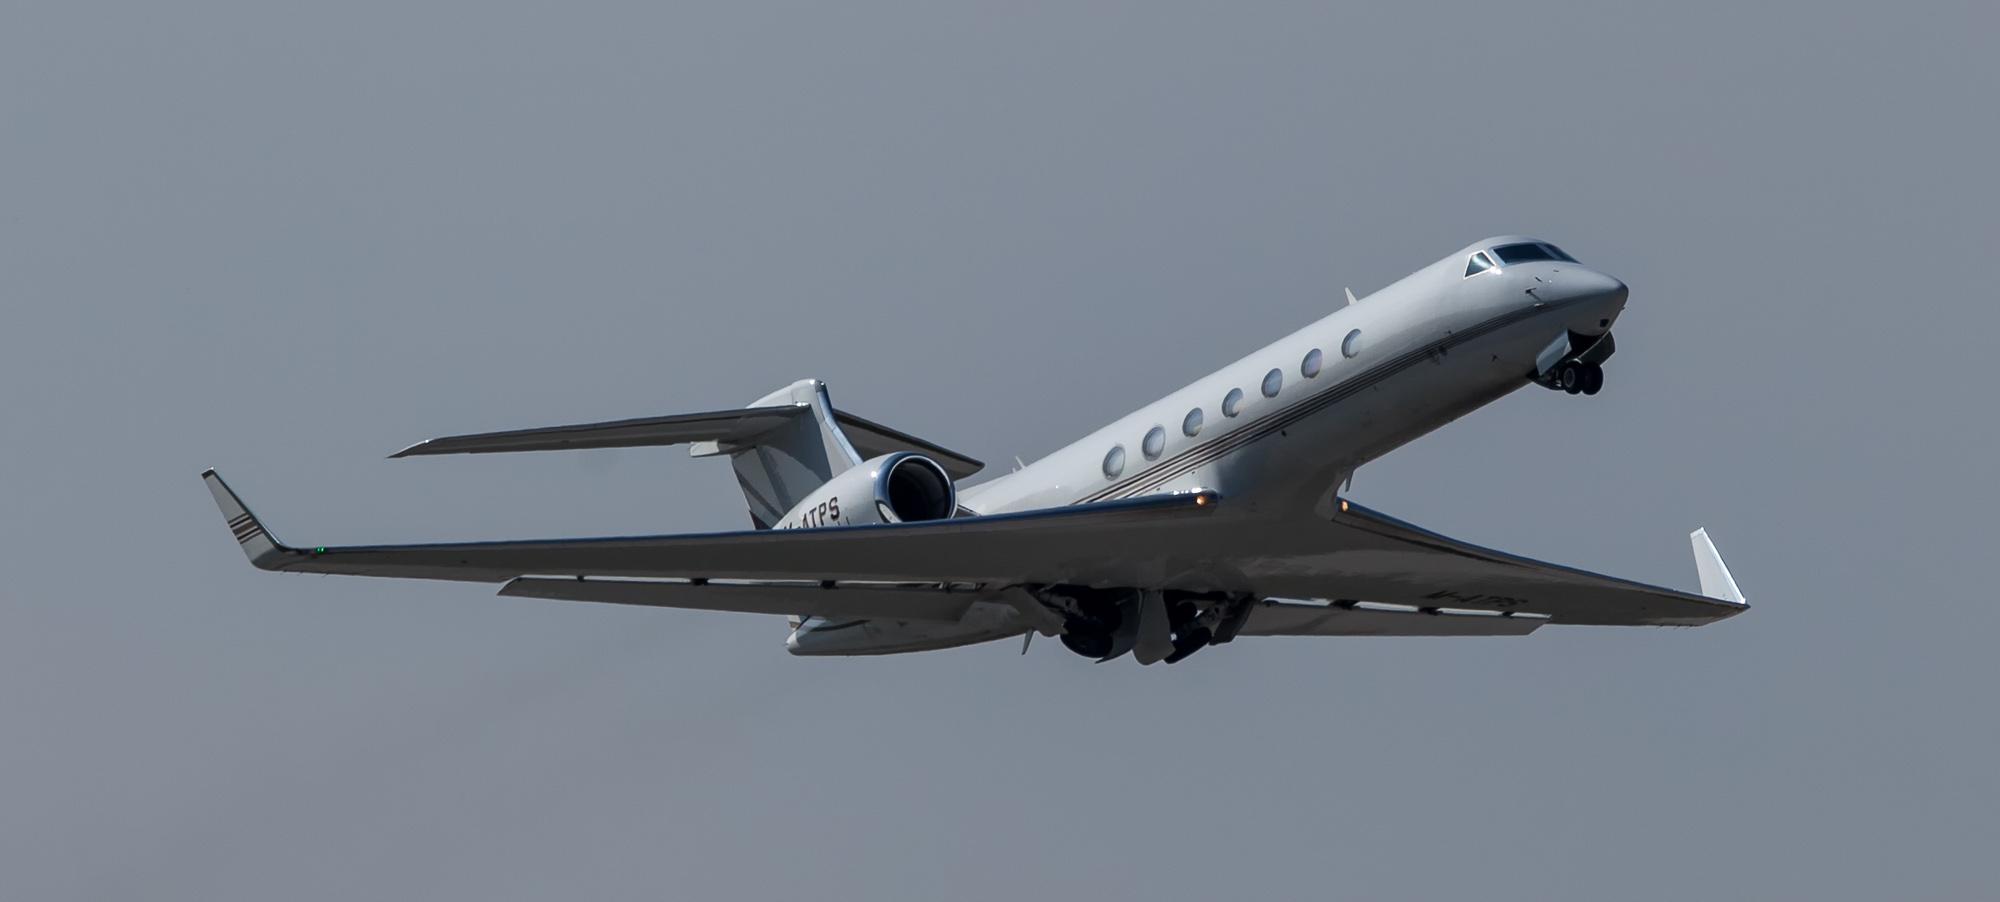 Gulfstream Aerospace G550